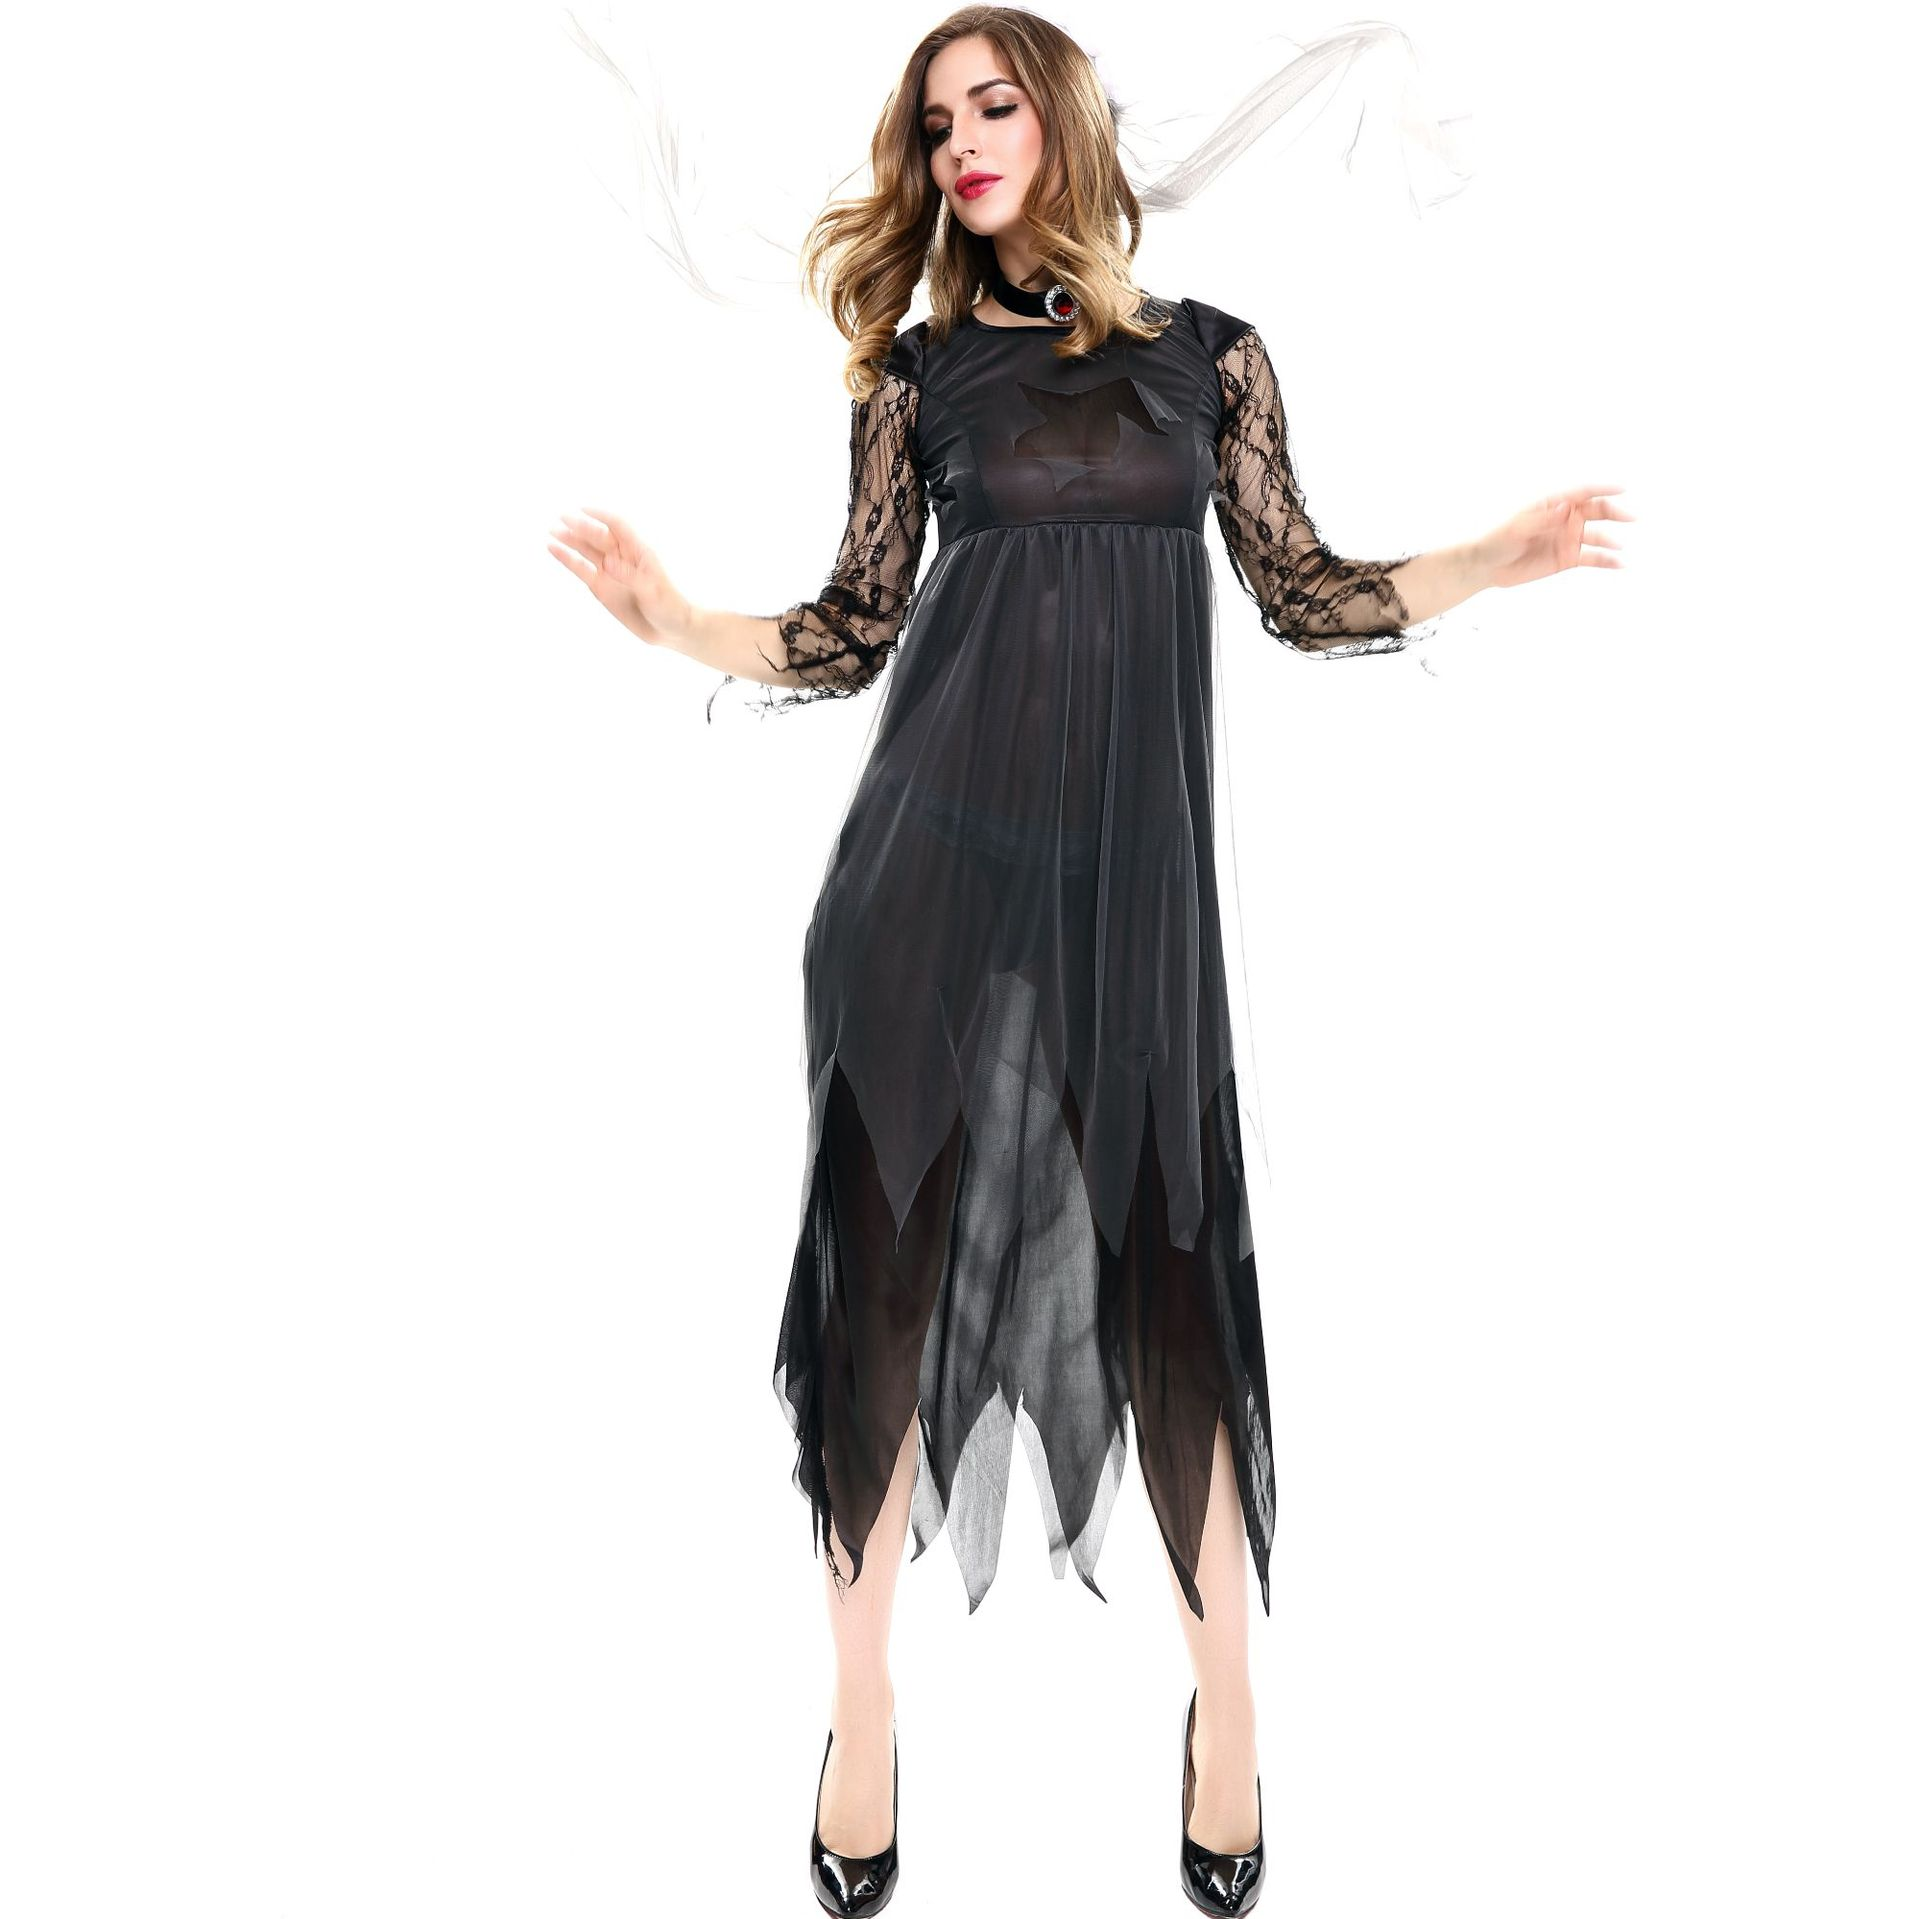 Zombie Corpse Grey Blood Skirt Costume Womens Ladies Halloween Ghost Fancy Dress